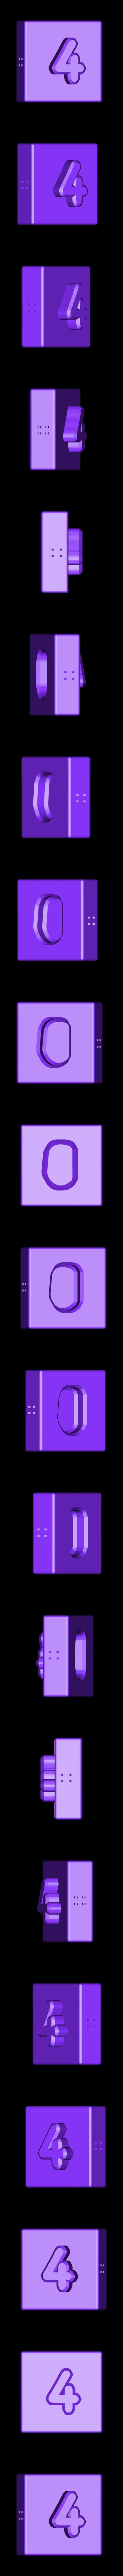 4.stl Download free STL file Mental blocks • Object to 3D print, RevK